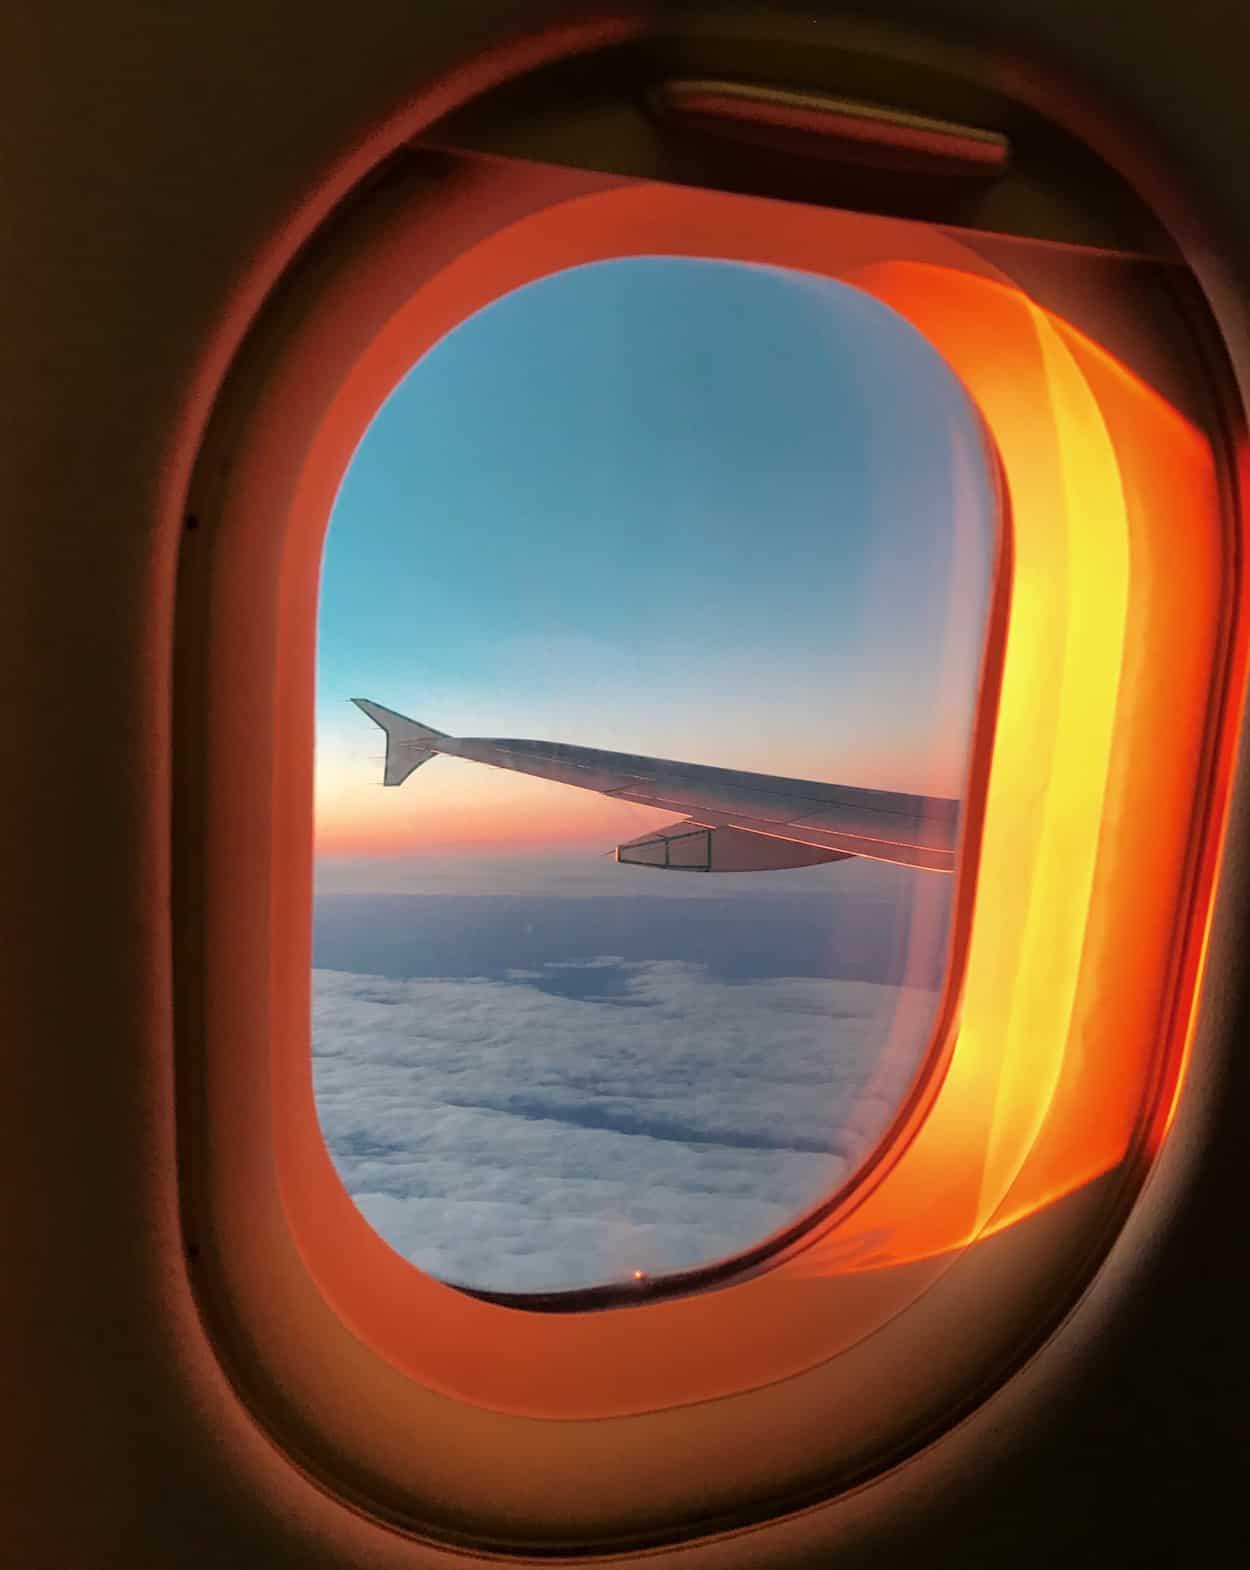 Airplane window during sunrise